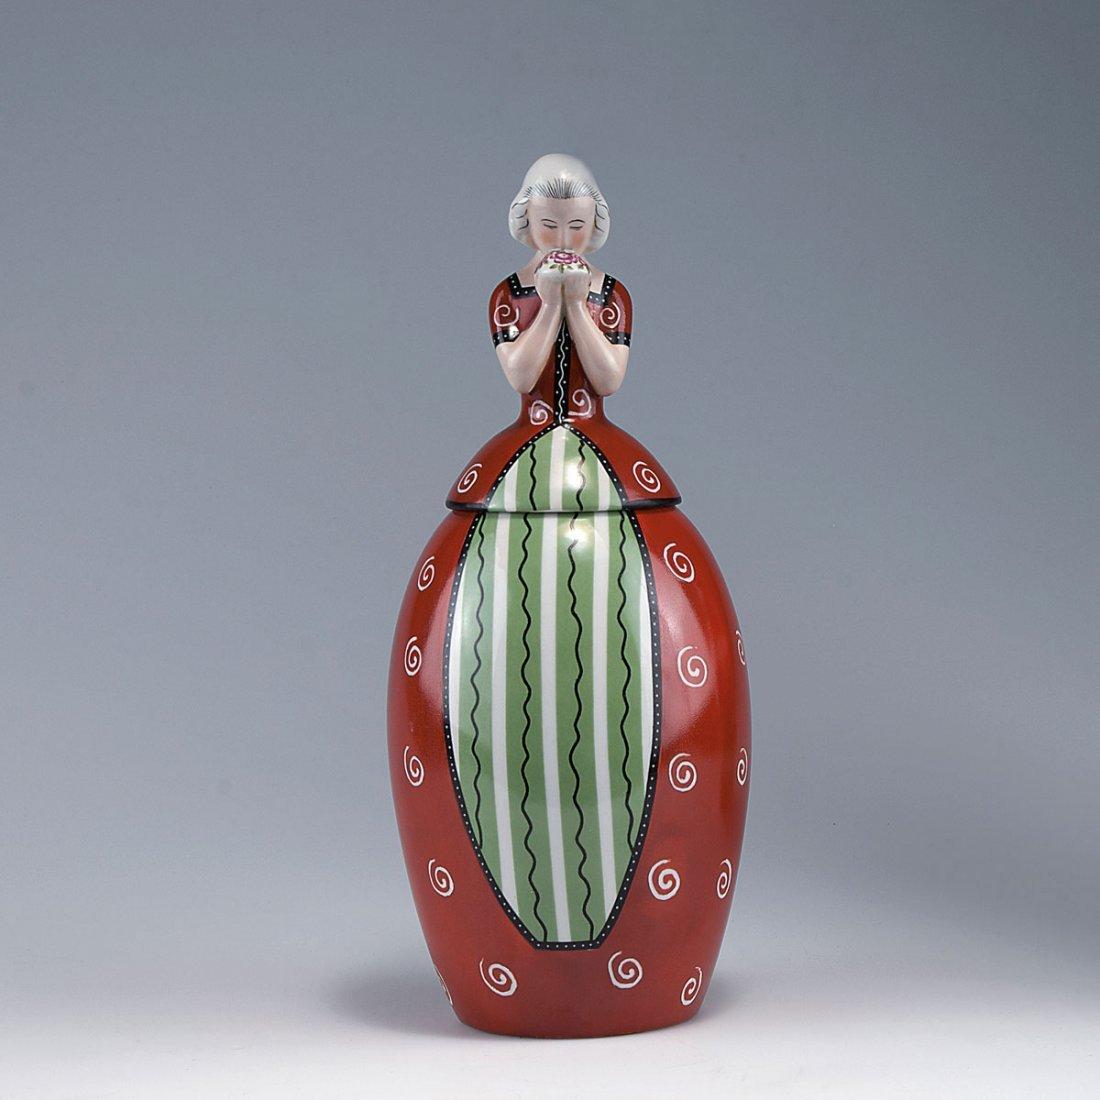 Figurative covered vase, c1927